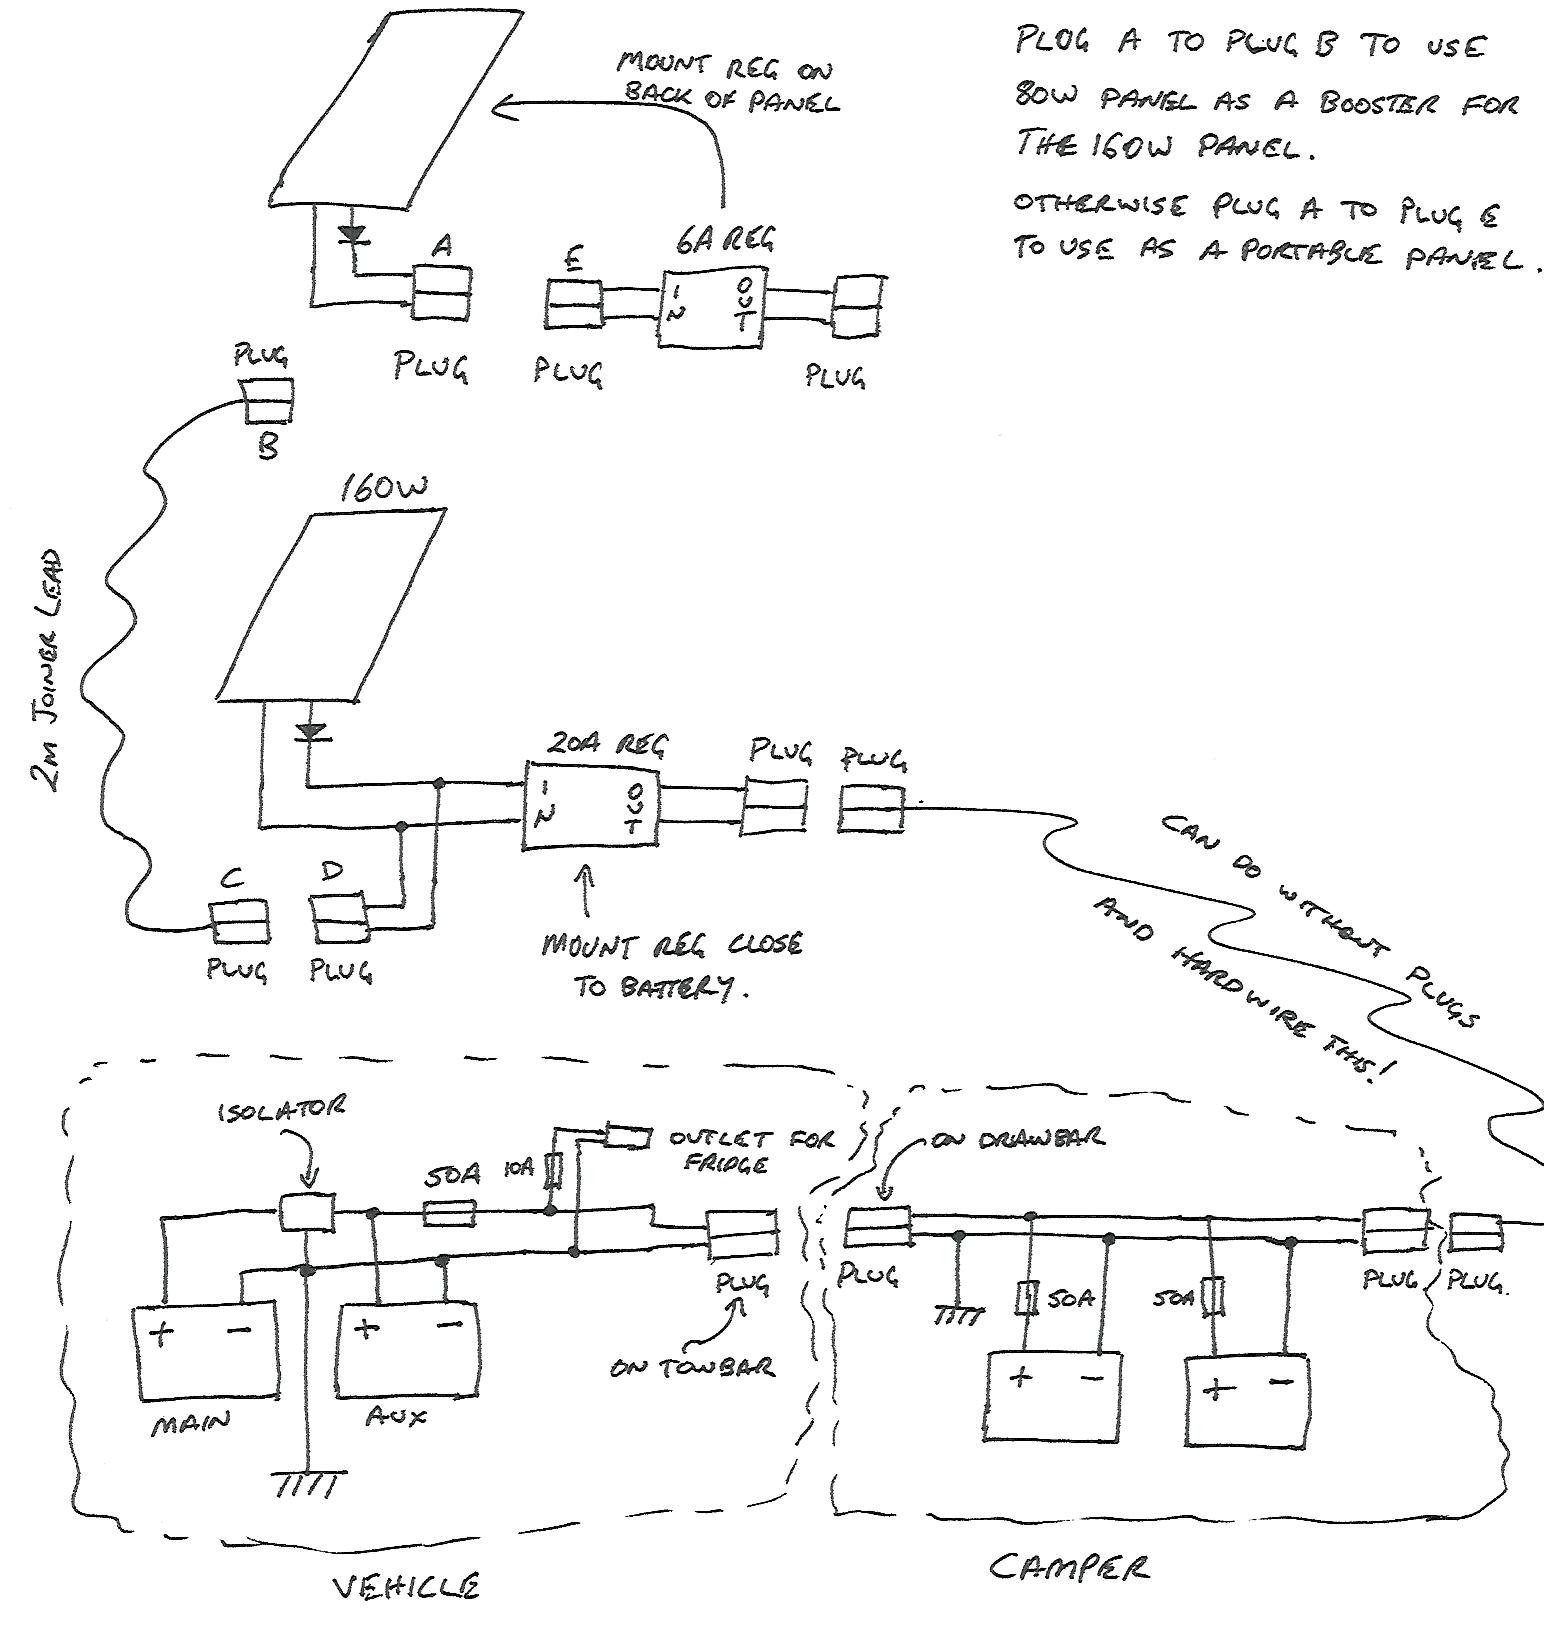 Ok 0077 Pop Up C Ers Additionally Starcraft Pop Up C Er Wiring Diagram